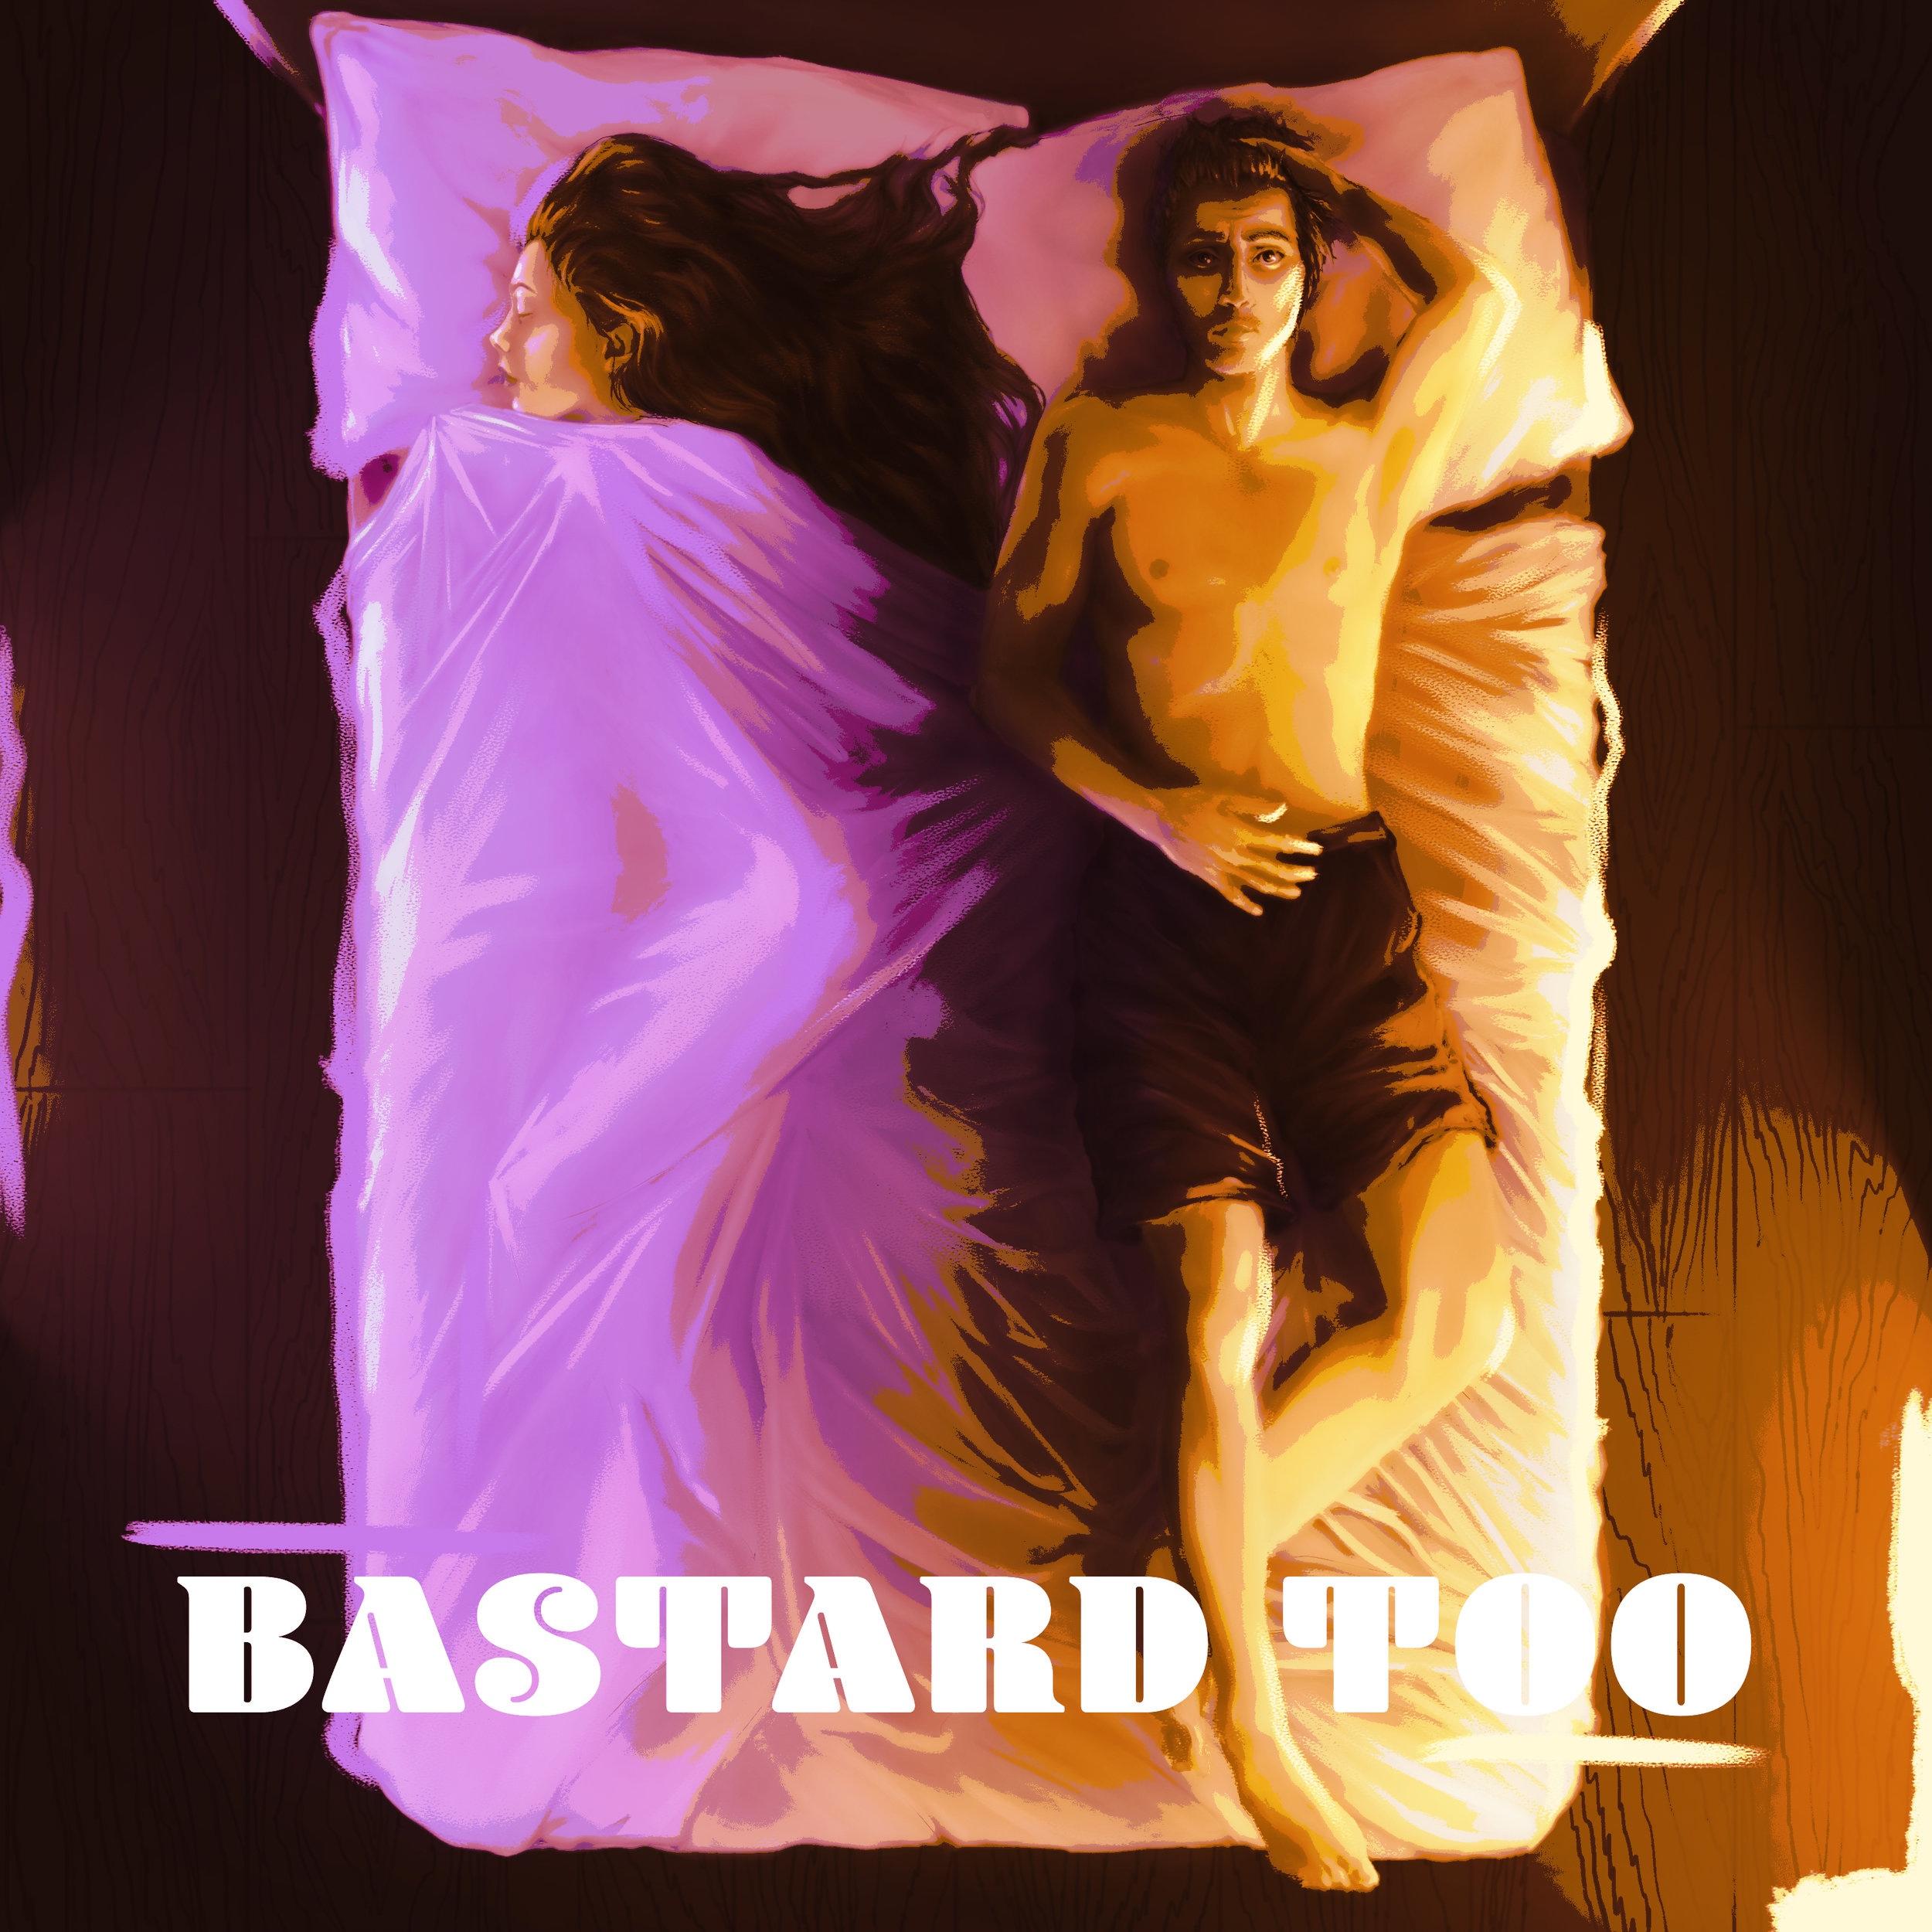 Bastard+Too+Cover+Art+Final.jpg